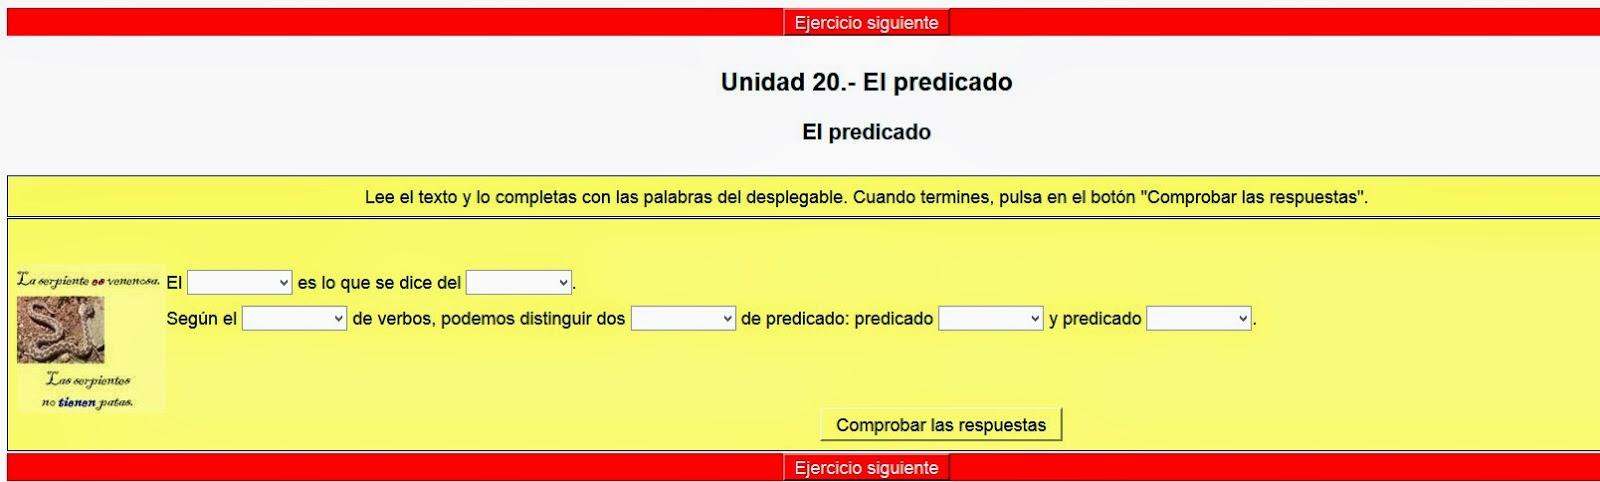 http://cplosangeles.juntaextremadura.net/web/lengua_tercer_ciclo/gramatica/clases_predicado/predicado01.htm